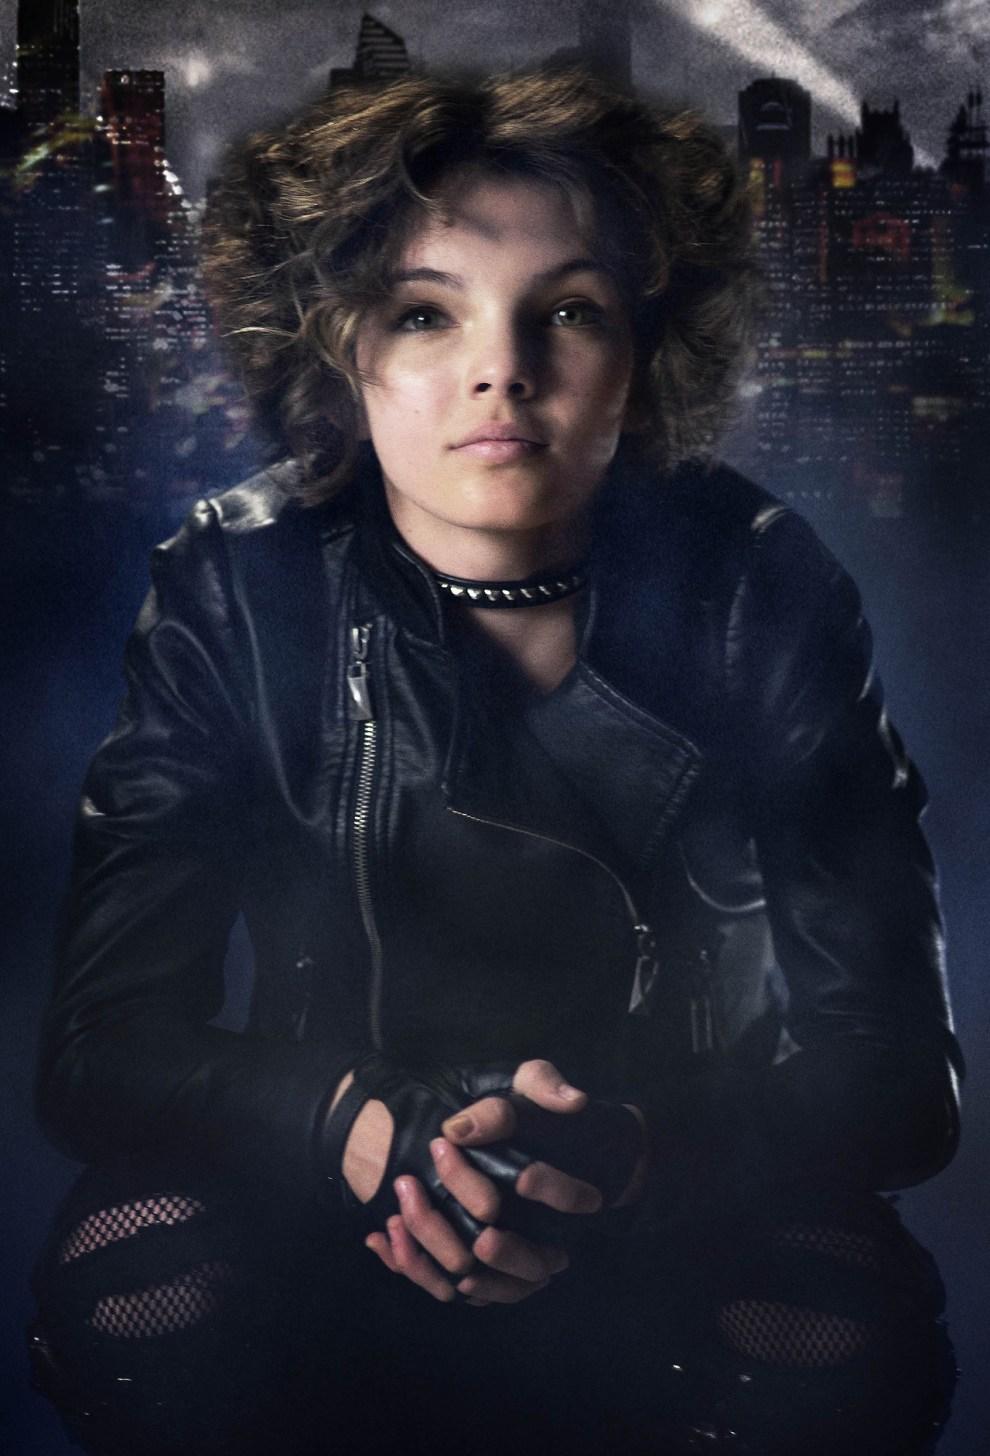 Selina Kyle (a.k.a. Catwoman)